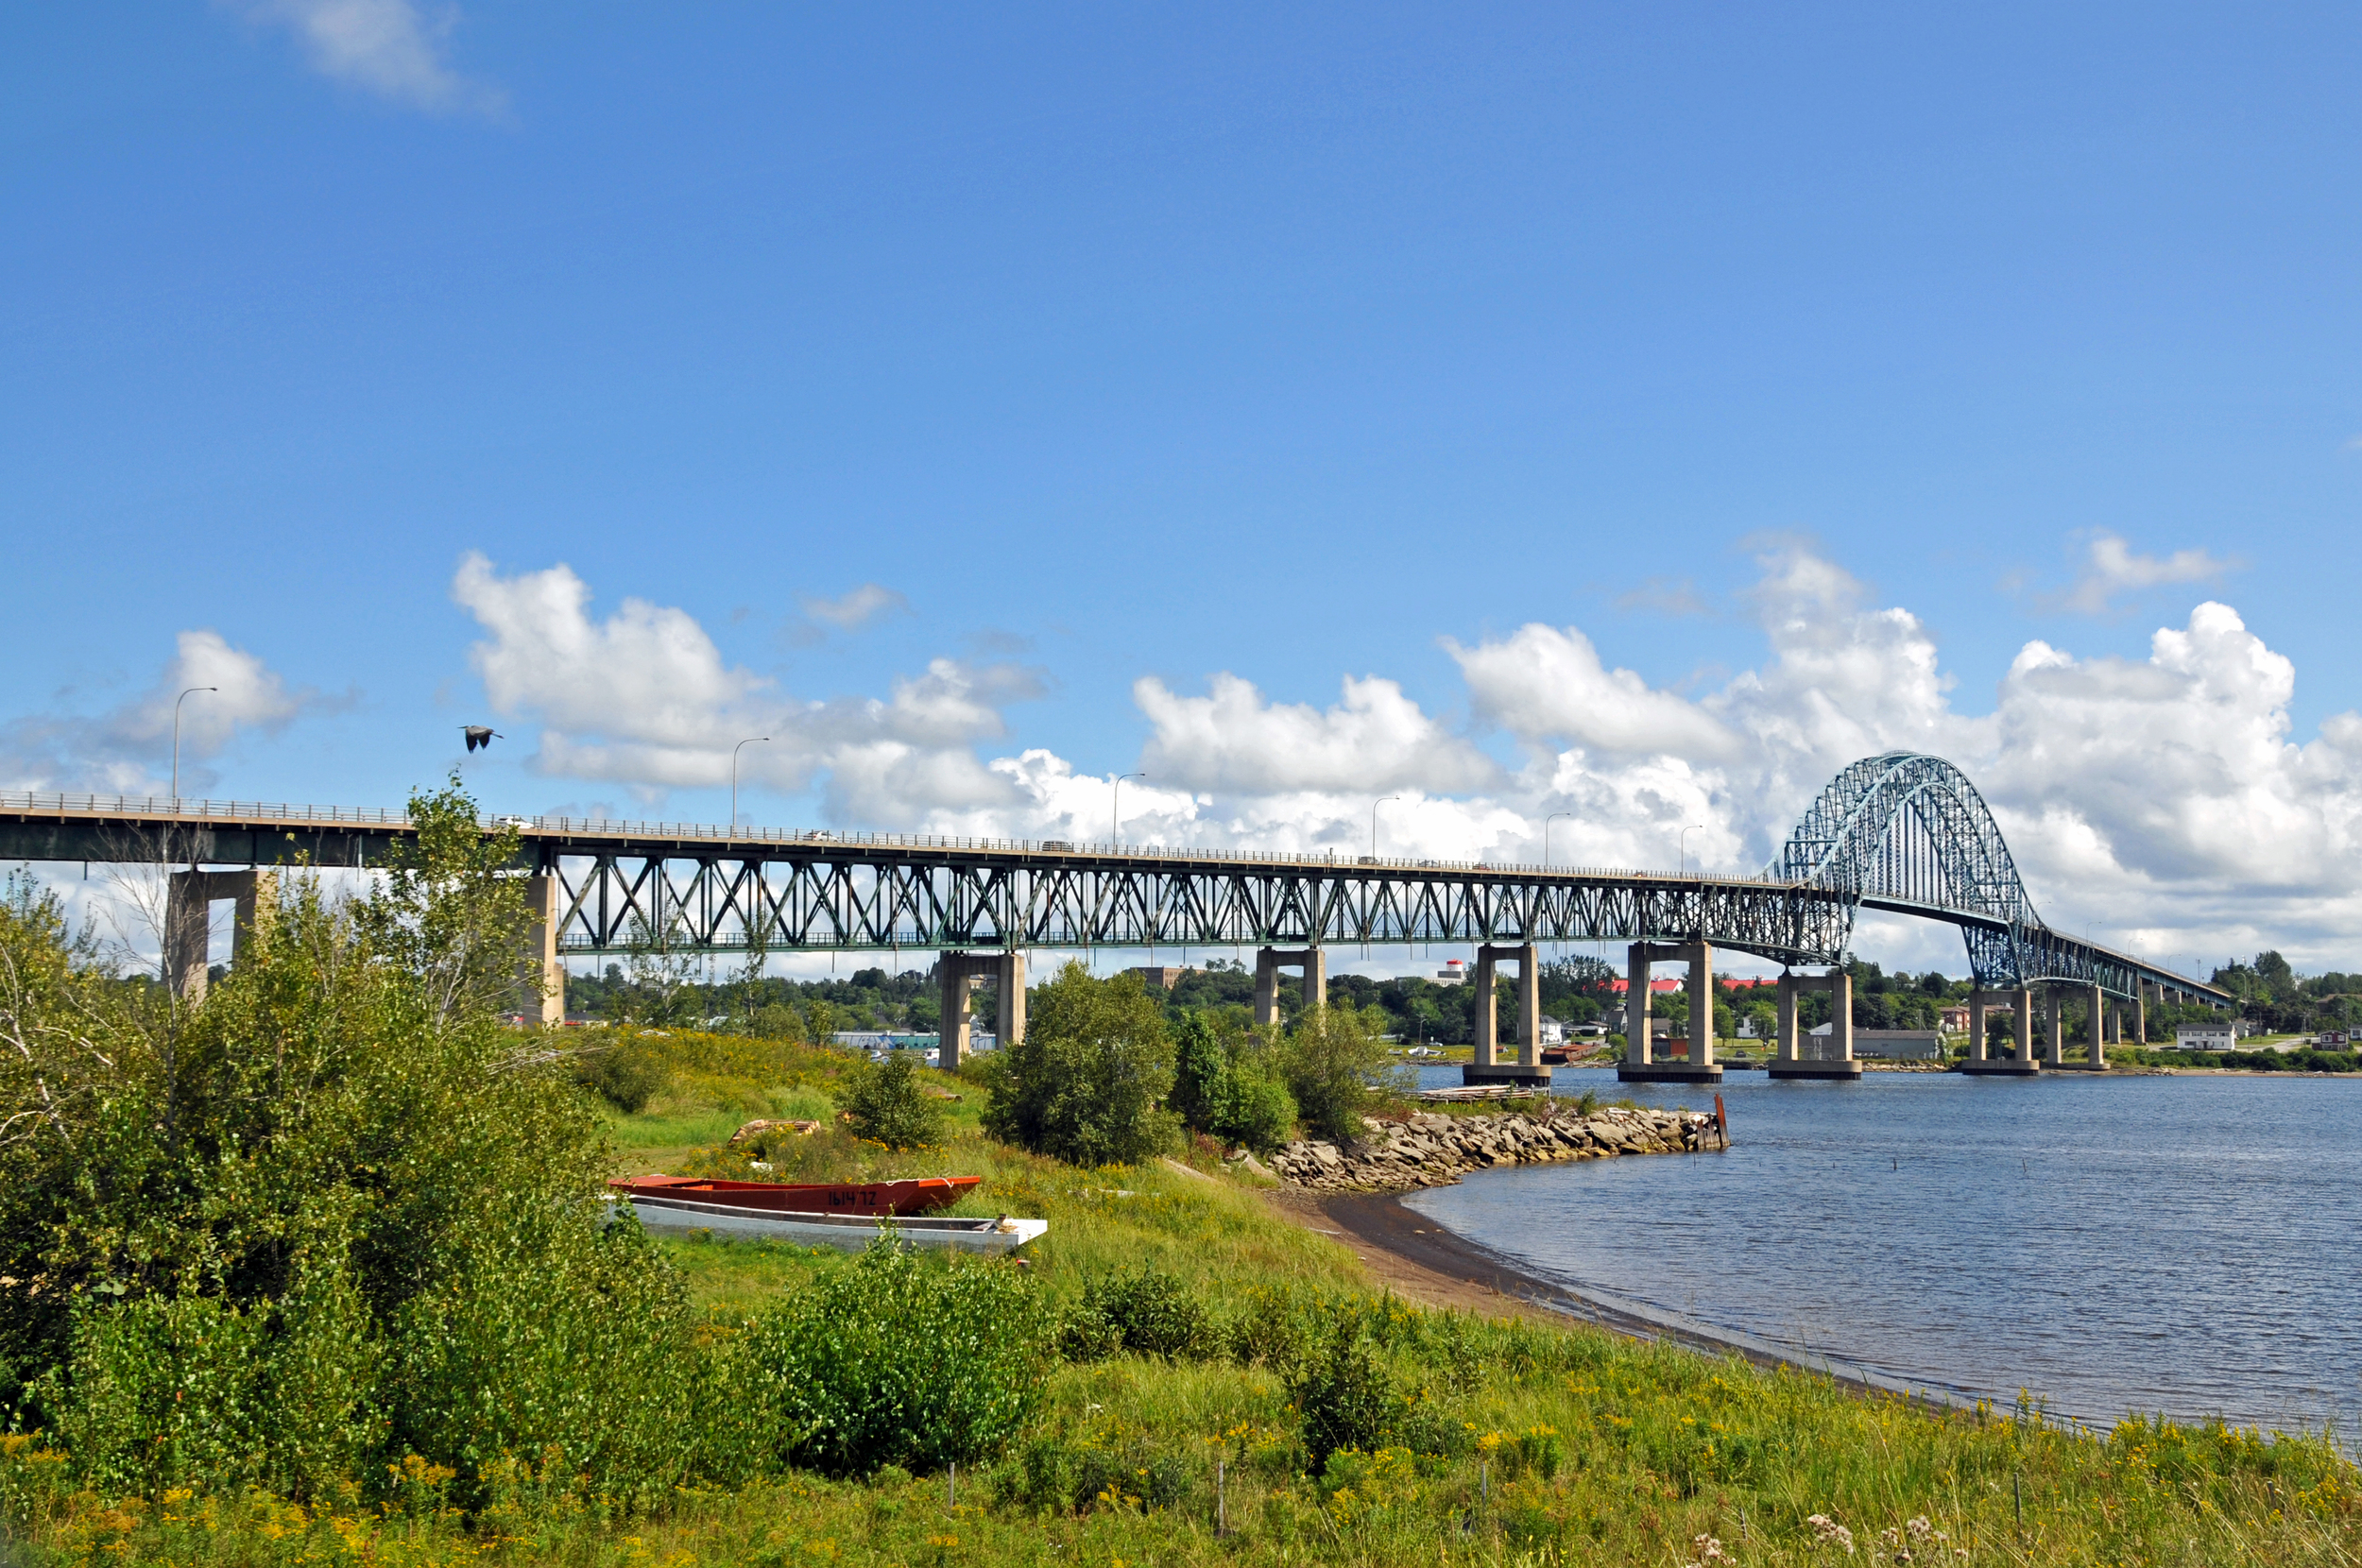 Centeniel Bridge (image from wikipedia)